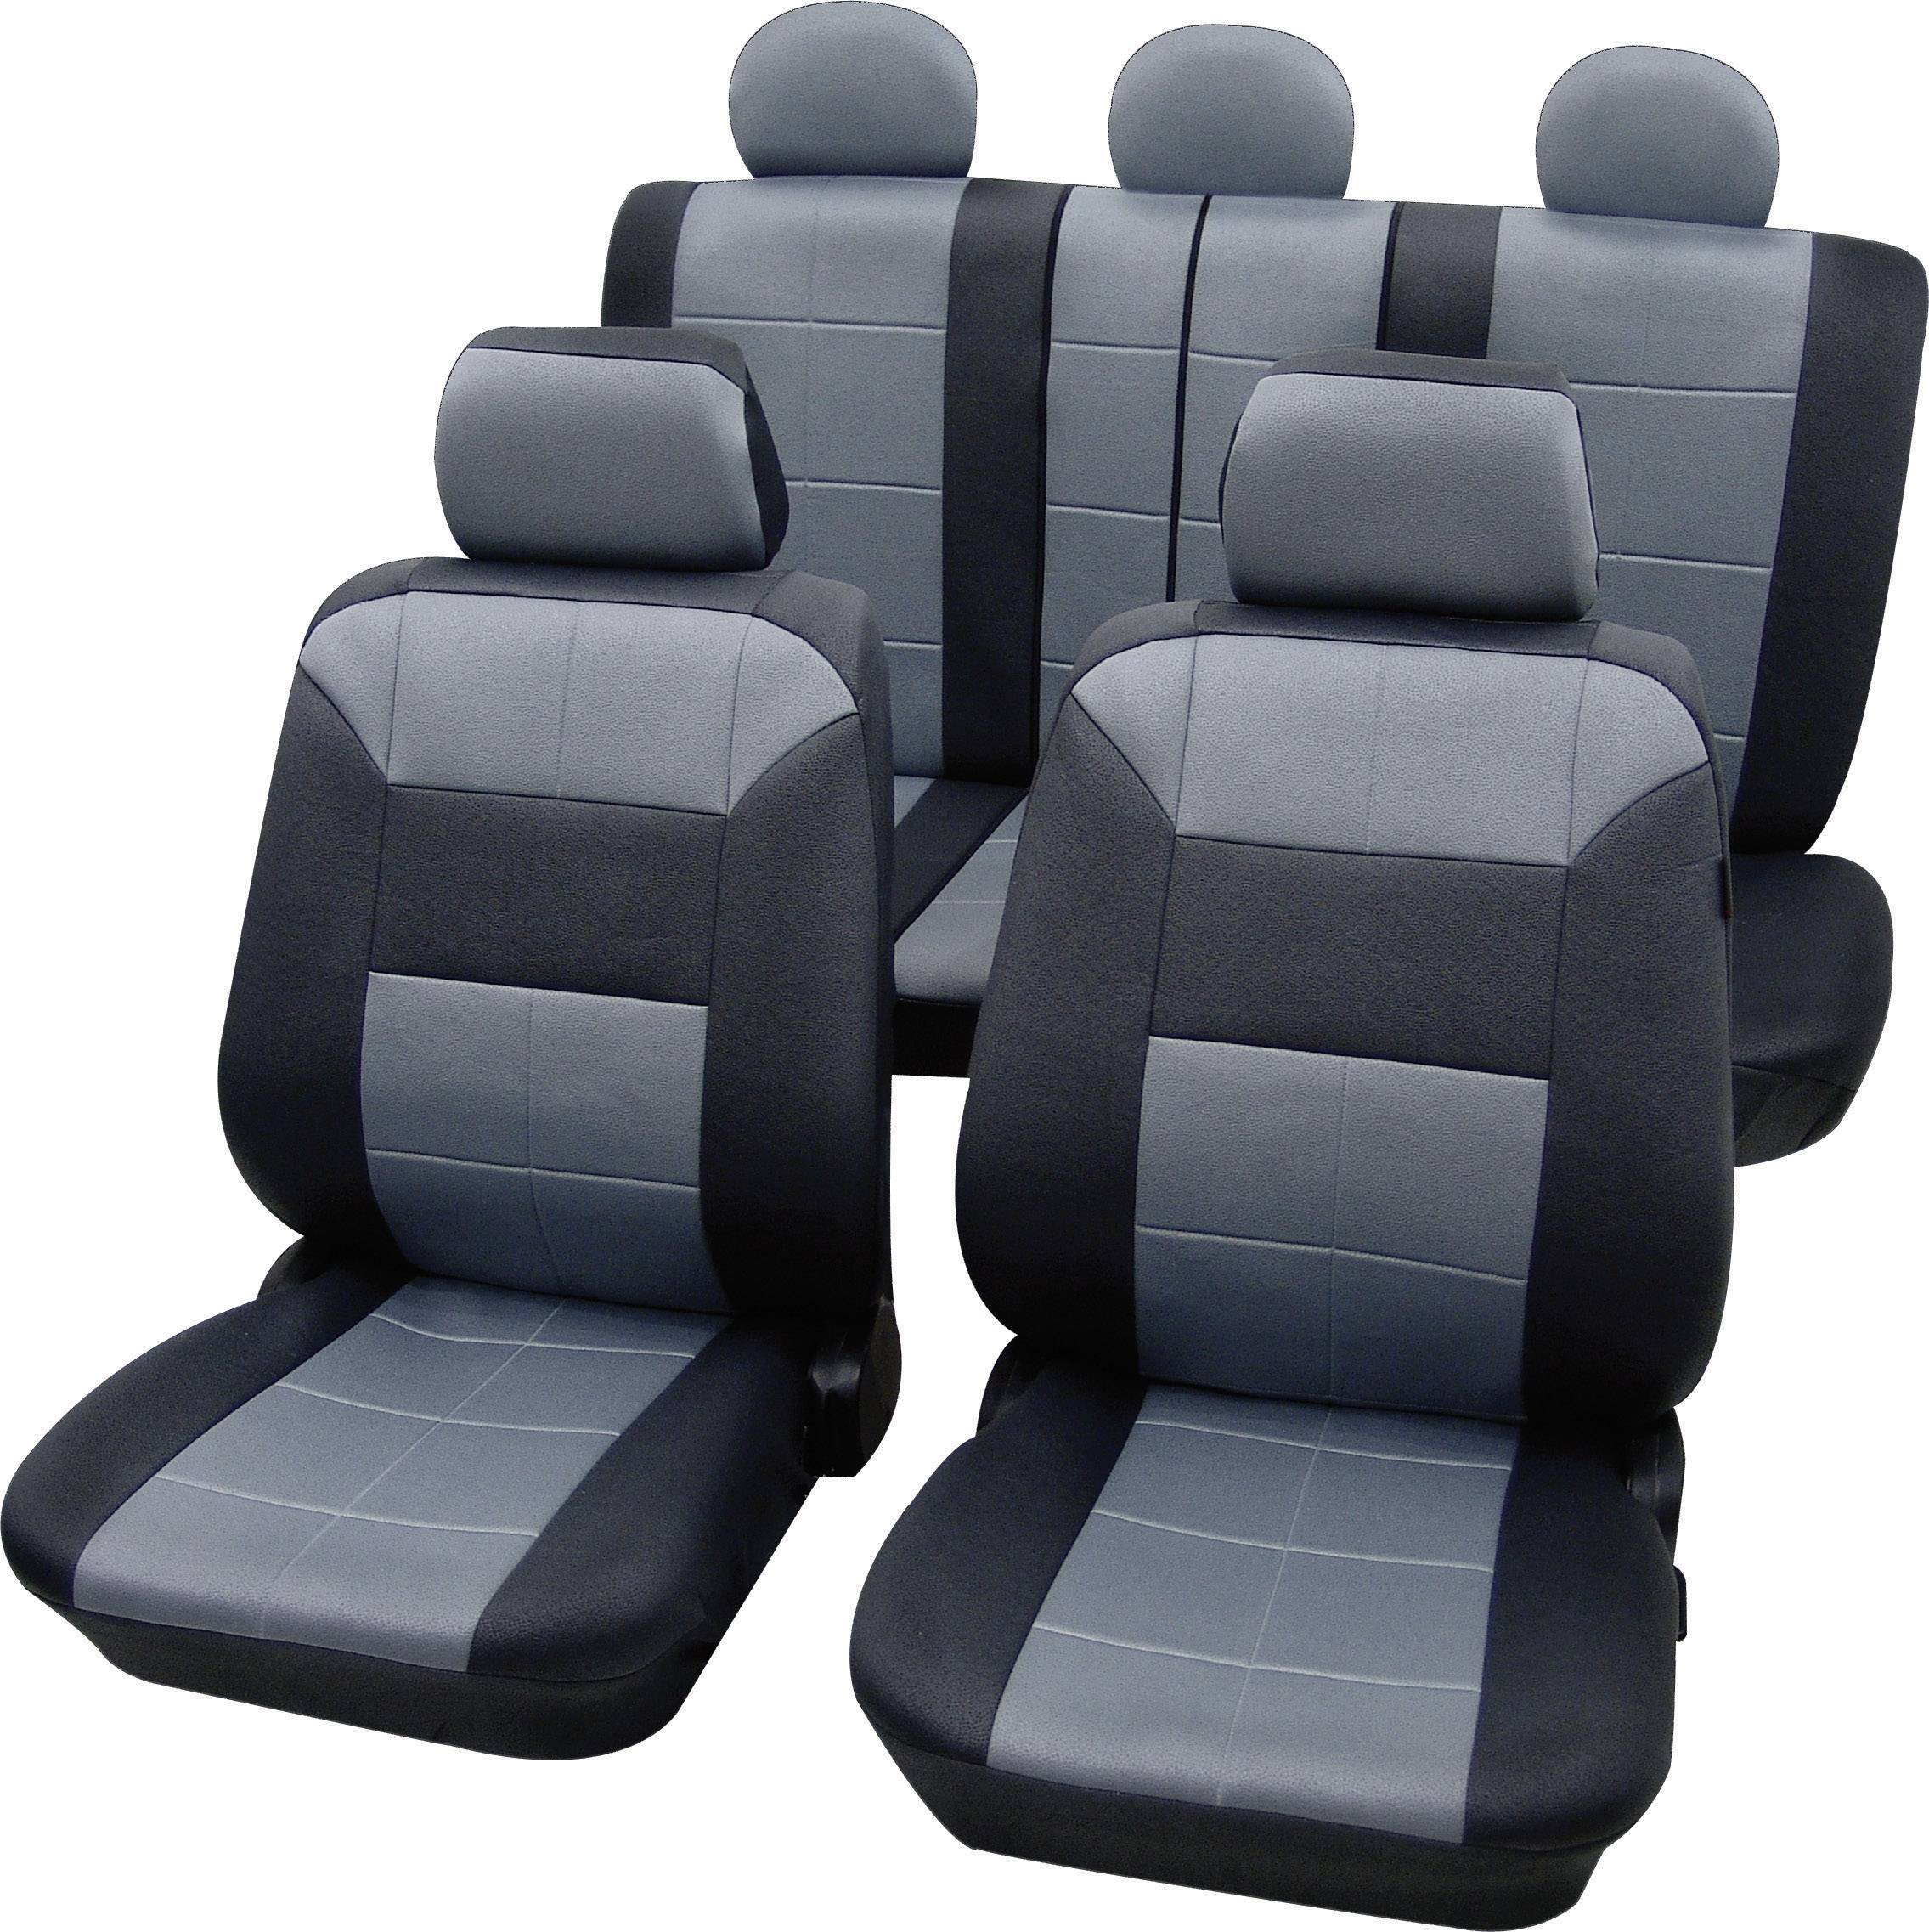 Autopoťahy Petex Dakar SAB 1 Vario Plus 22574918, 17-dielna, polyester, sivá, čierna